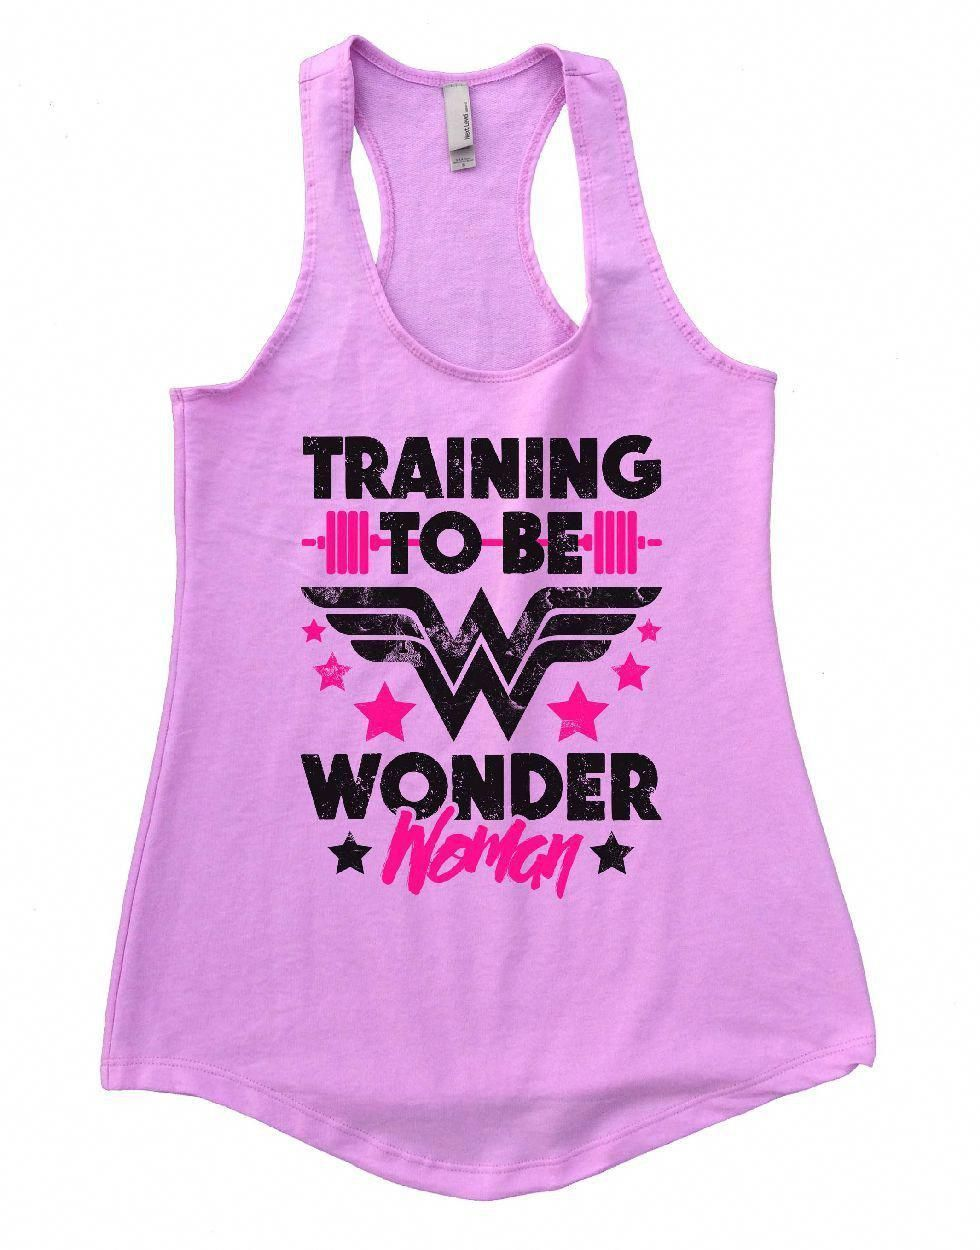 b4bf3867914fef TRAINING TO BE WONDER Woman Womens Workout Tank Top  WorkoutClothingWomen s